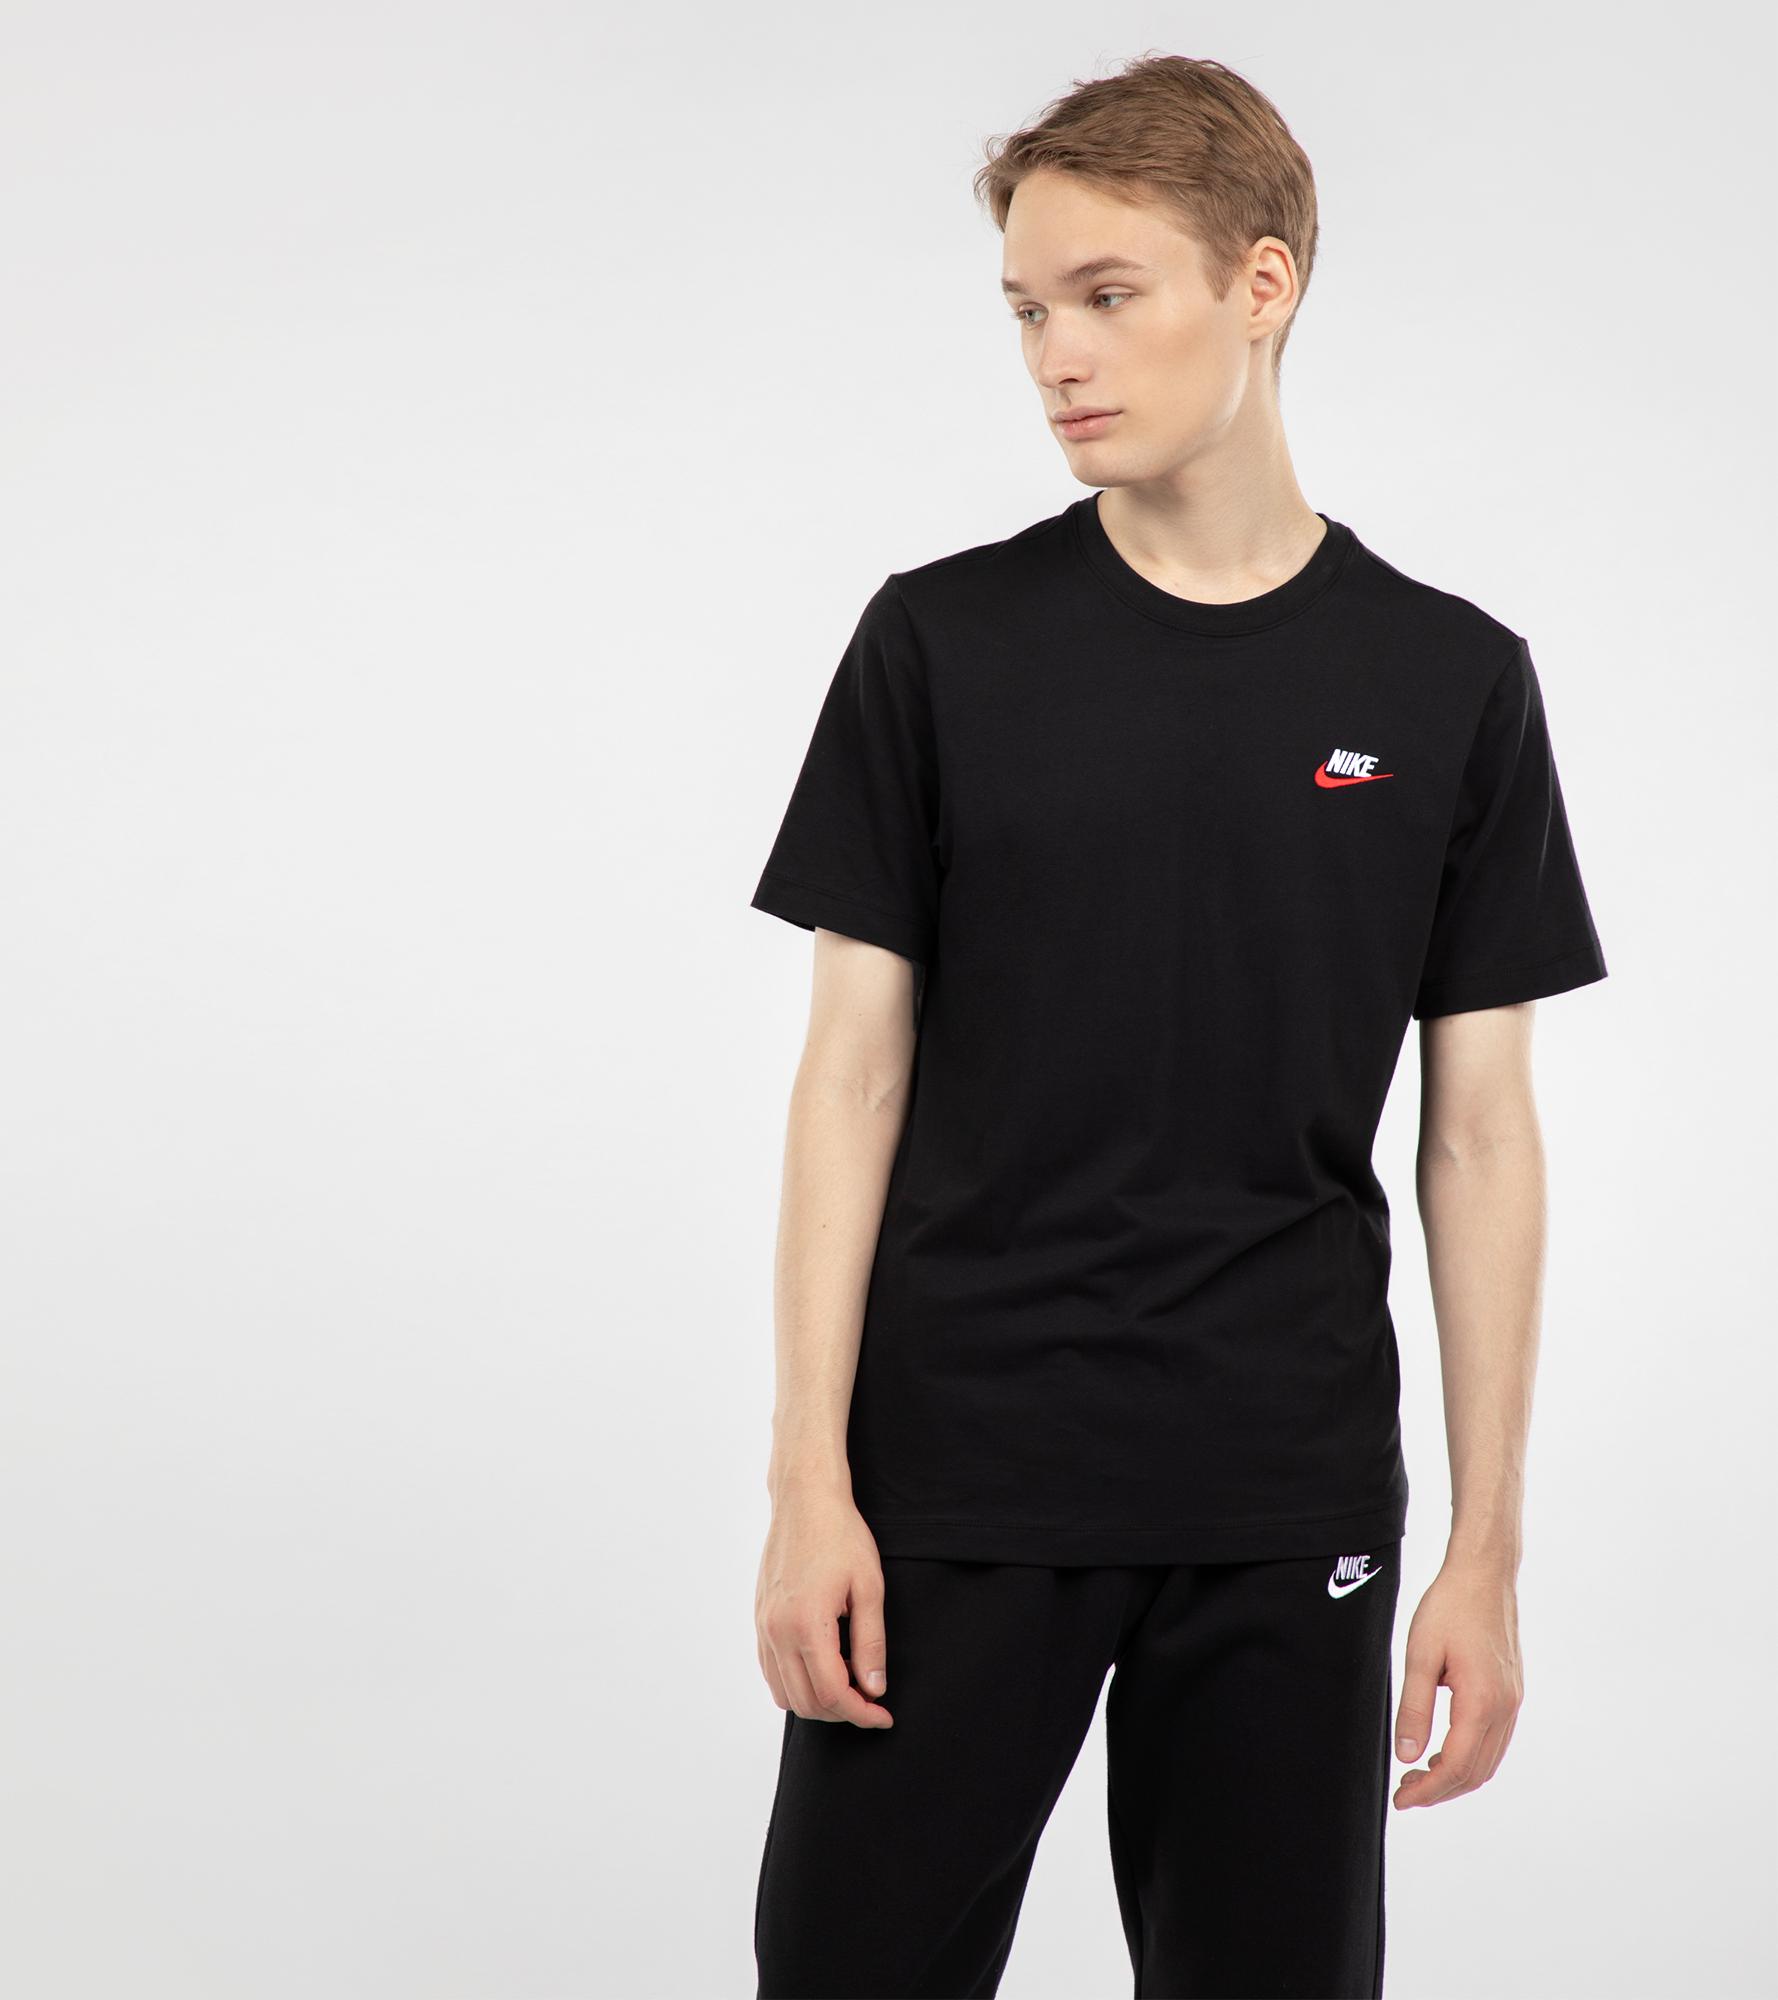 Nike Футболка мужская Nike Club, размер 52-54 недорго, оригинальная цена